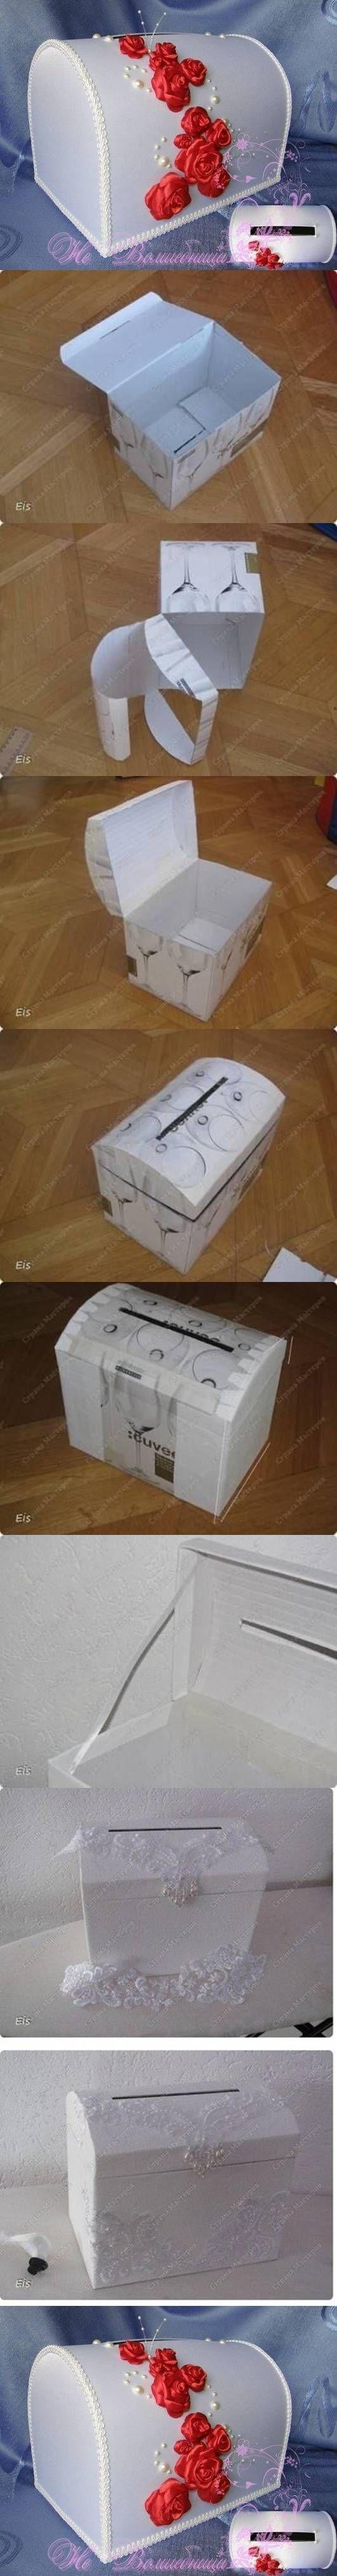 DIY Cardboard Box Art DIY Cardboard Box Art